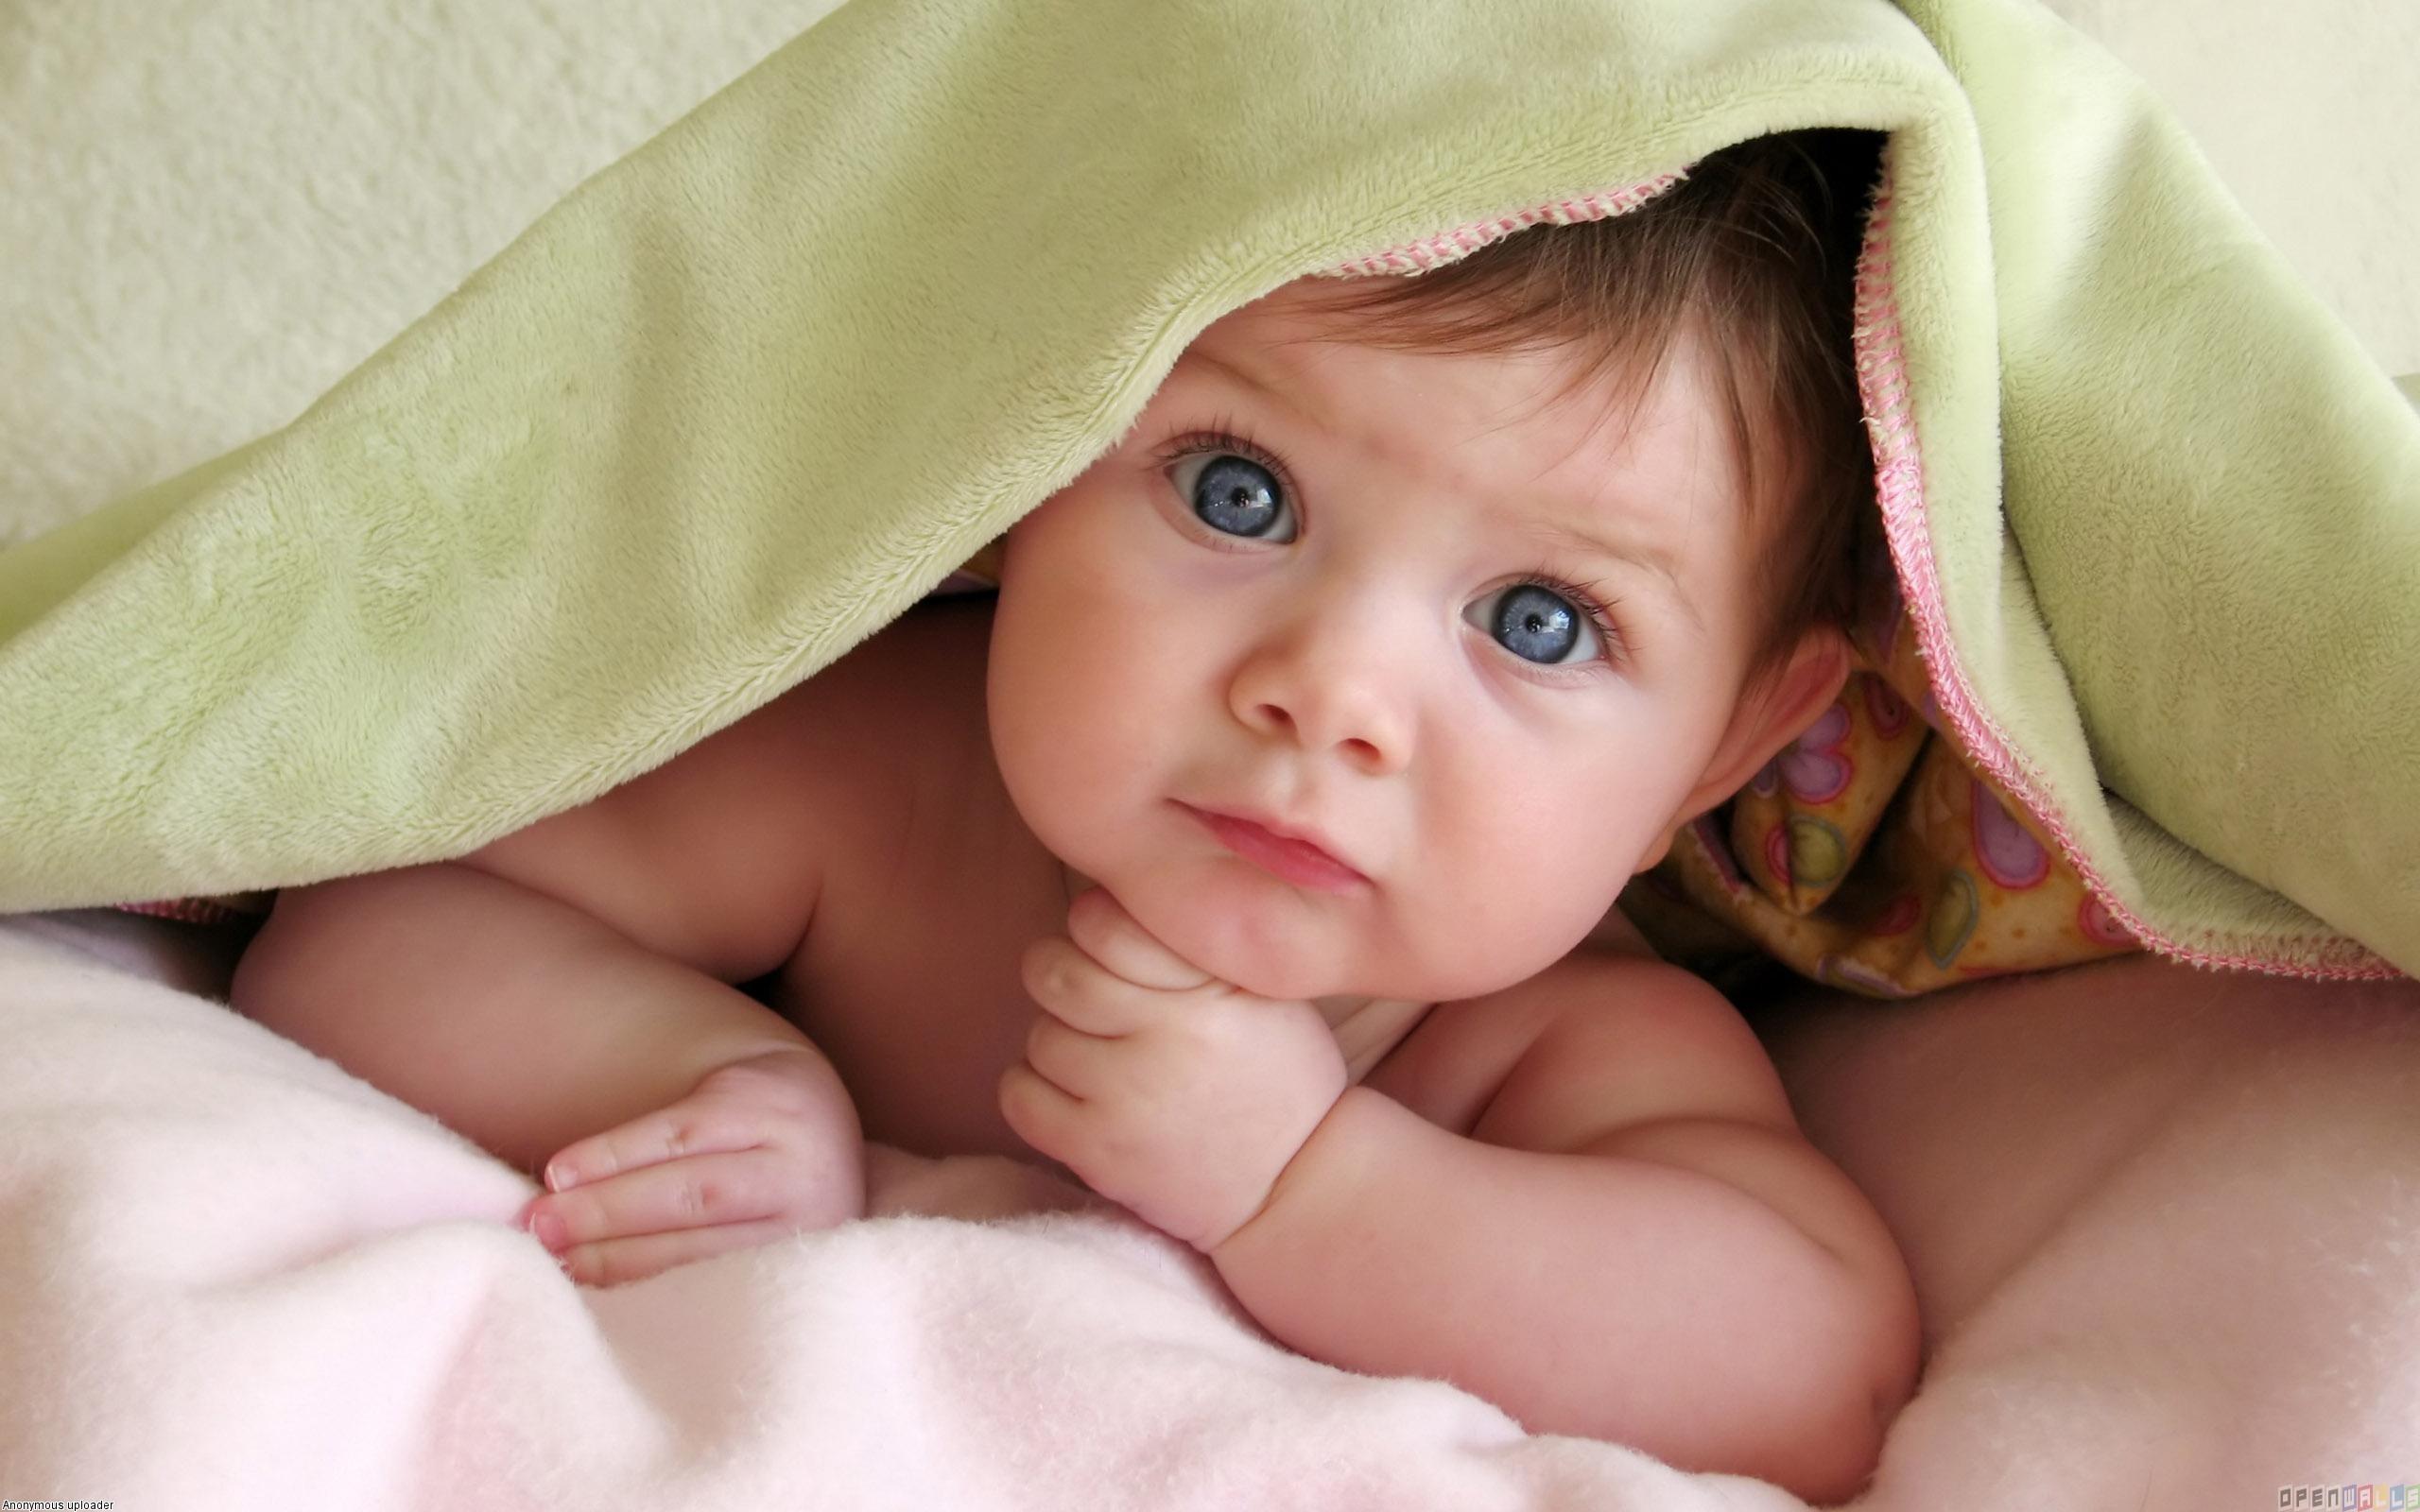 Cute Baby Girls 10545